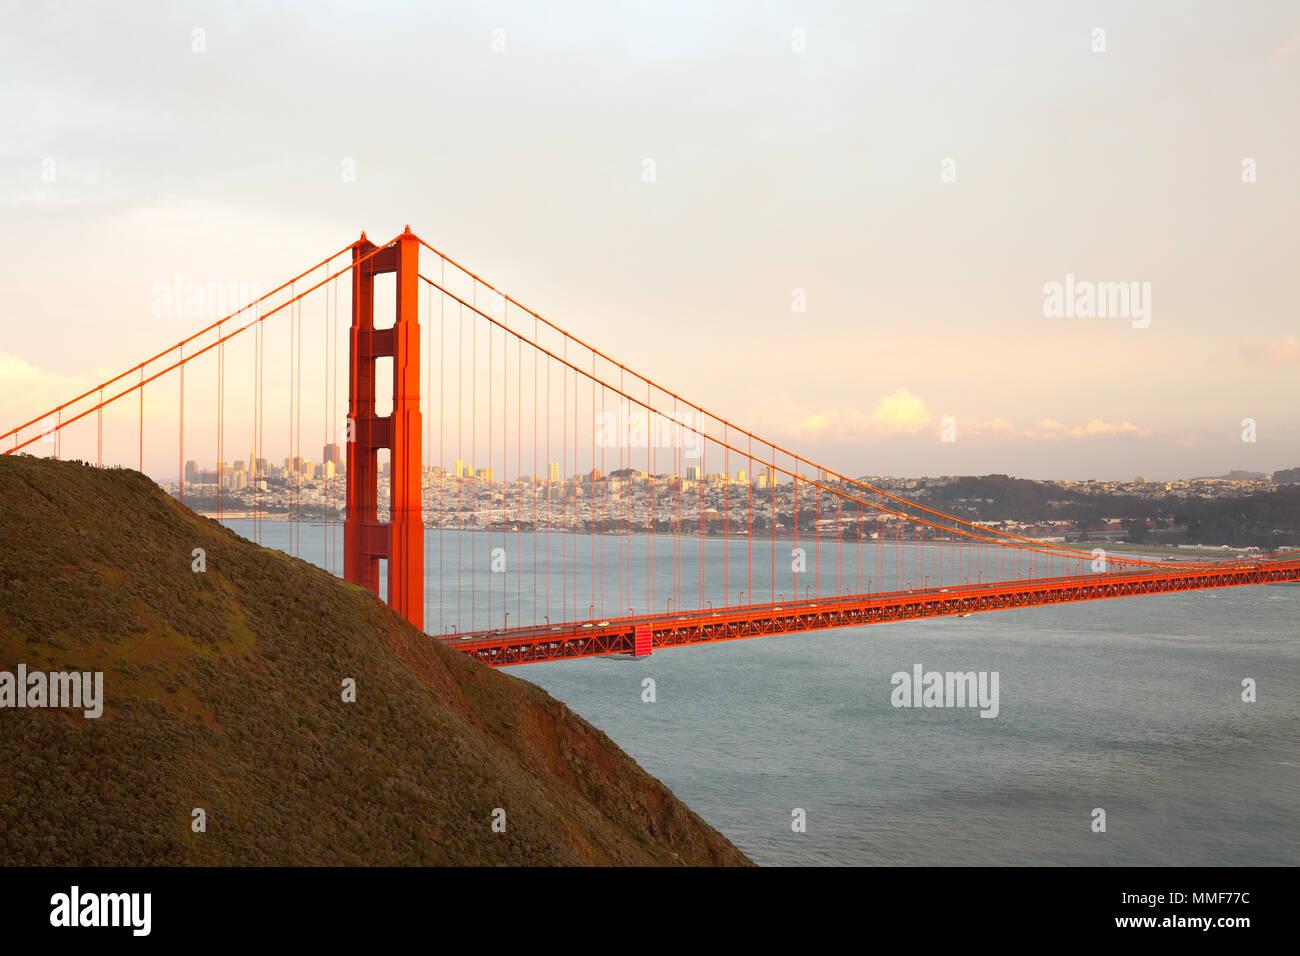 Le Golden Gate Bridge à San Francisco, Californie, USA Photo Stock